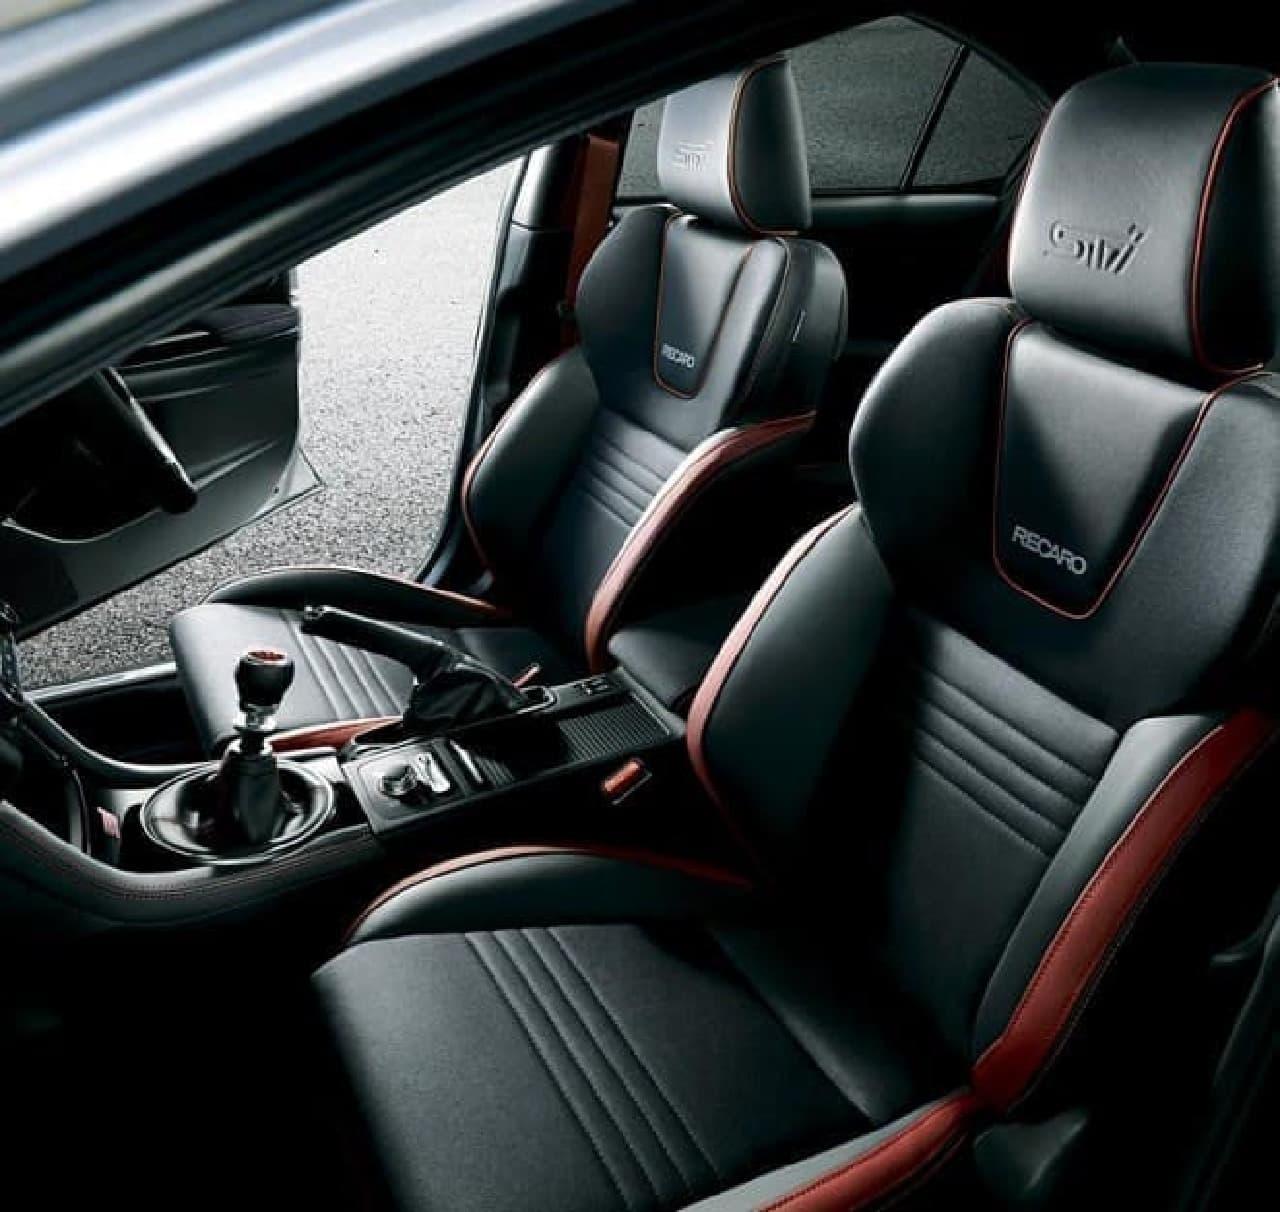 SUBARU、「WRX STI」大幅改良モデルを発表